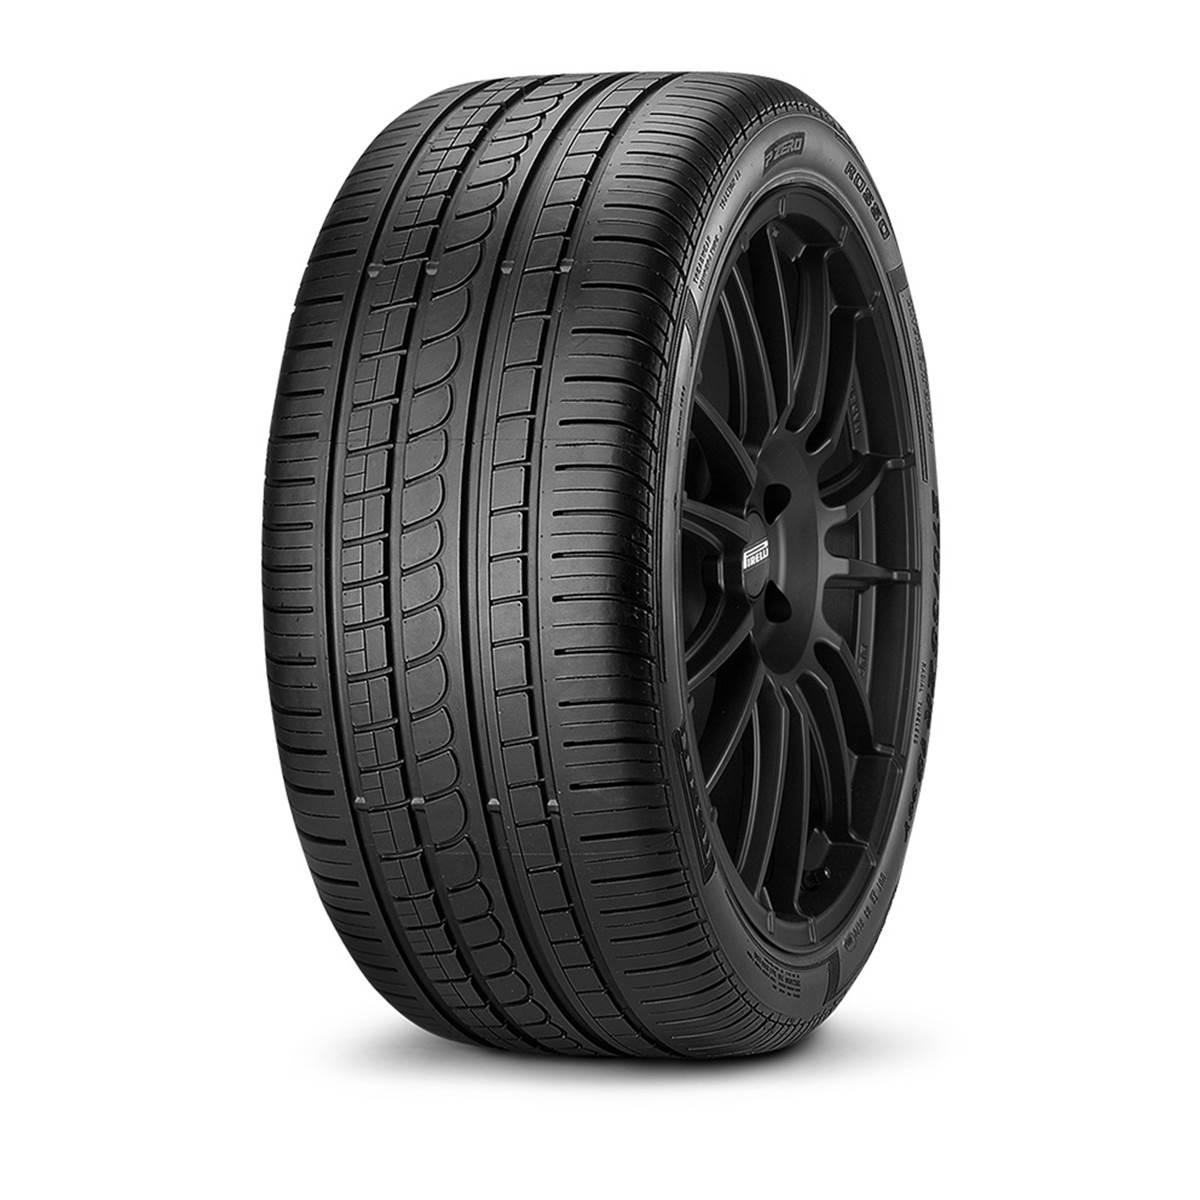 Pneu Pirelli 235/35R19 91Y Pzero Nero (Gt) XL